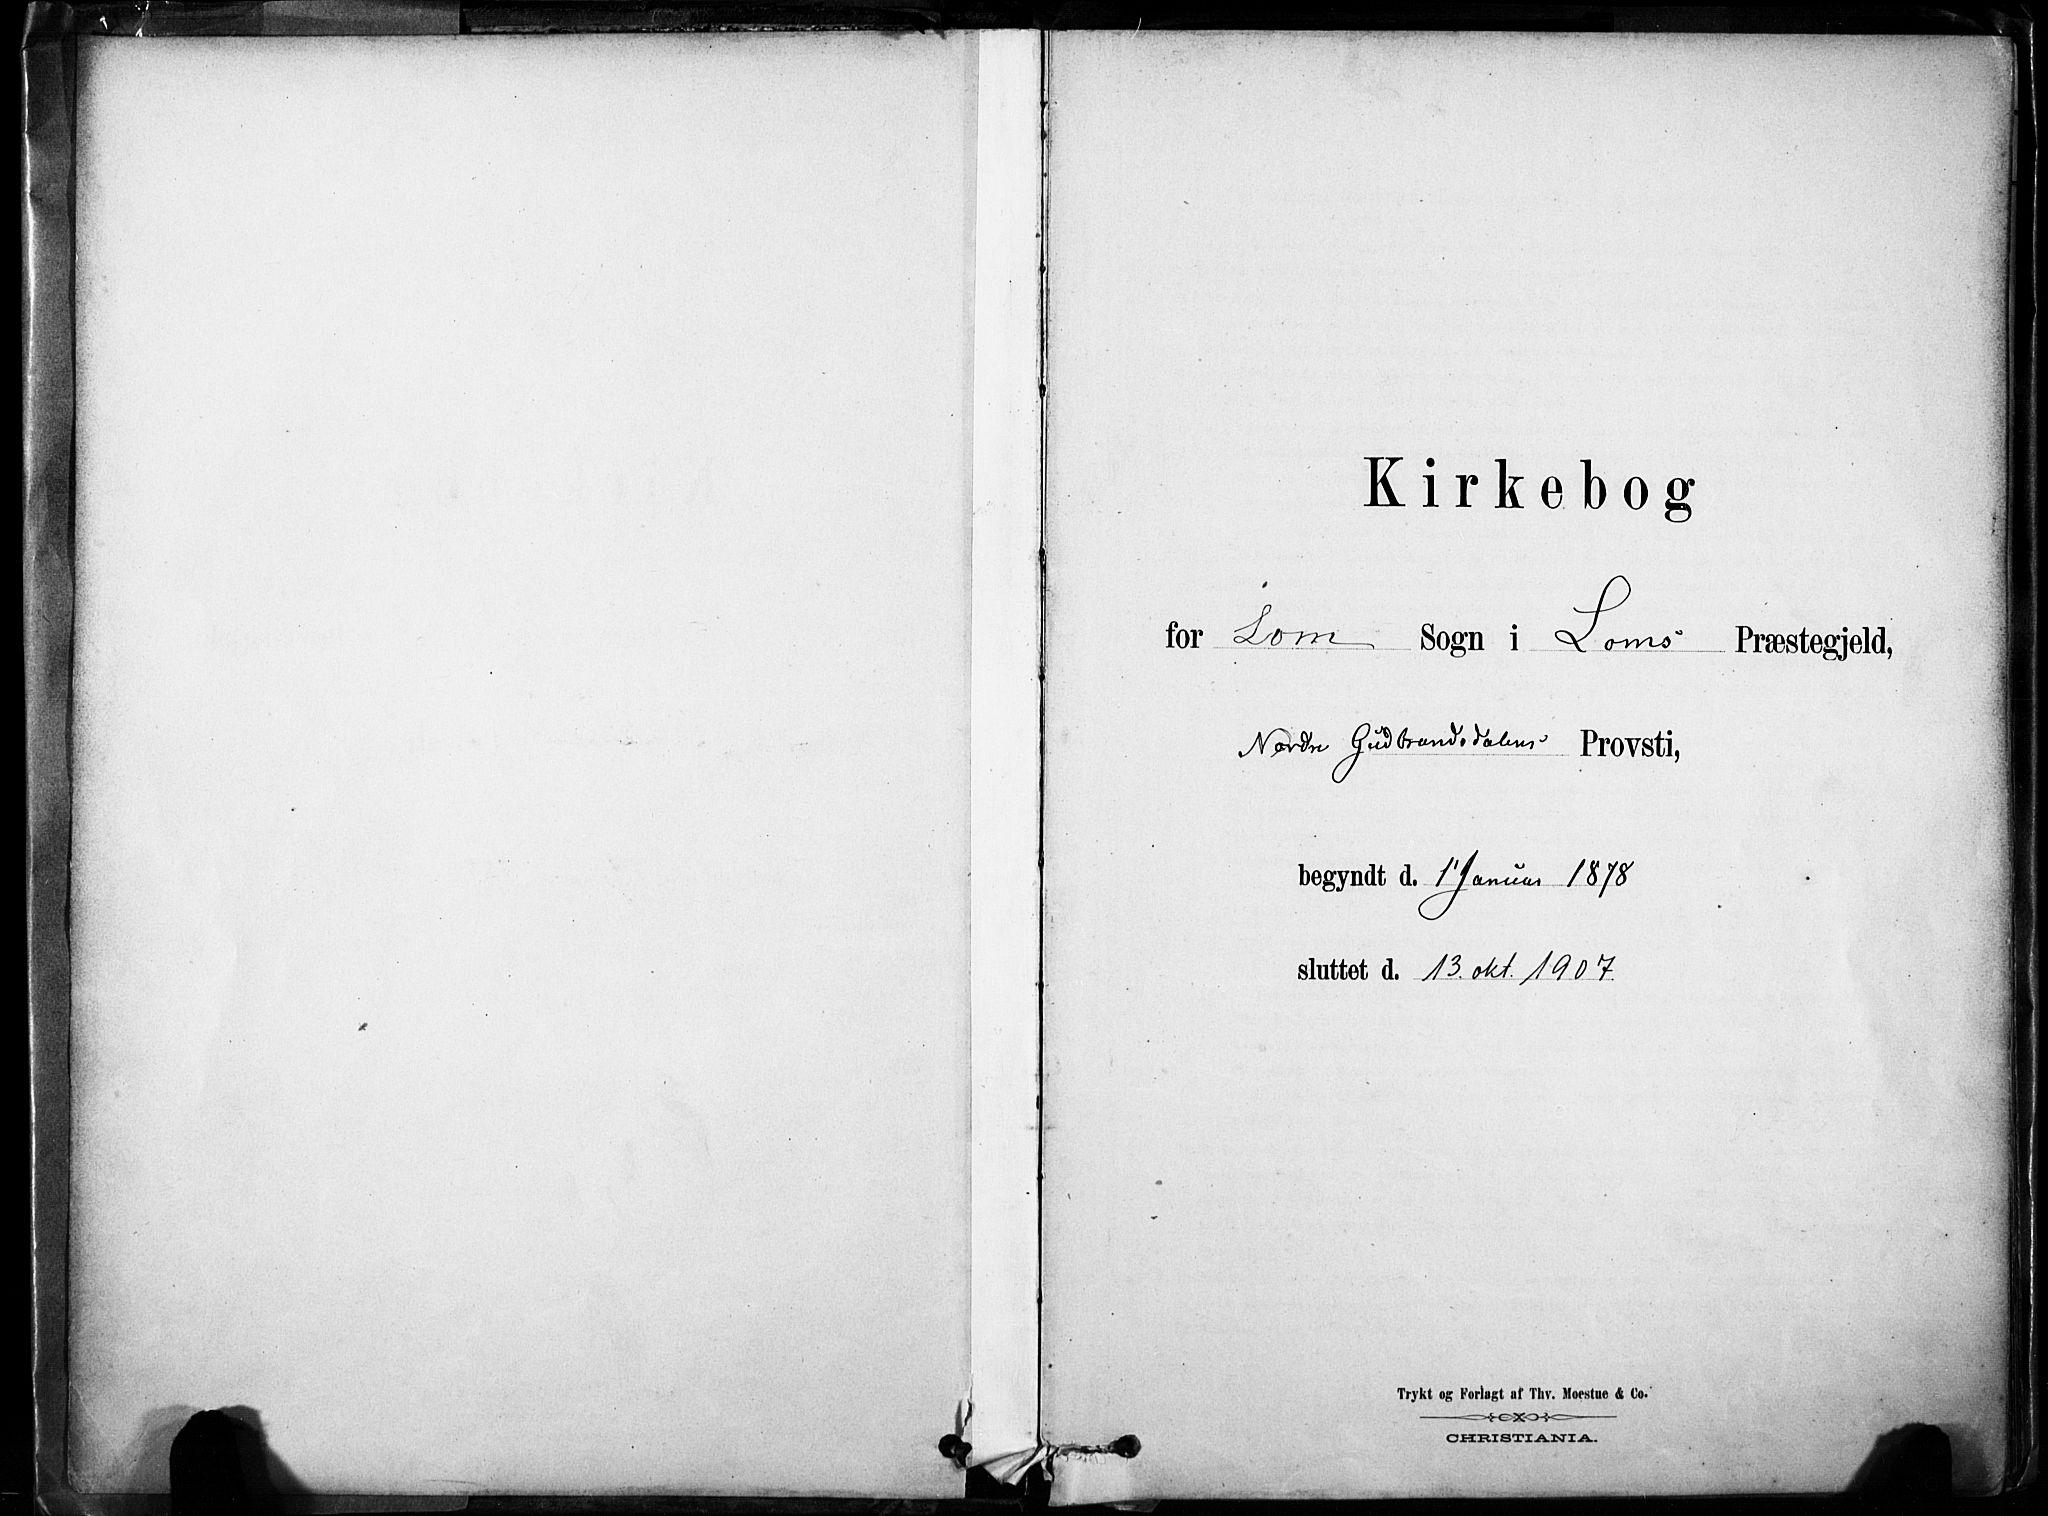 SAH, Lom prestekontor, K/L0009: Ministerialbok nr. 9, 1878-1907